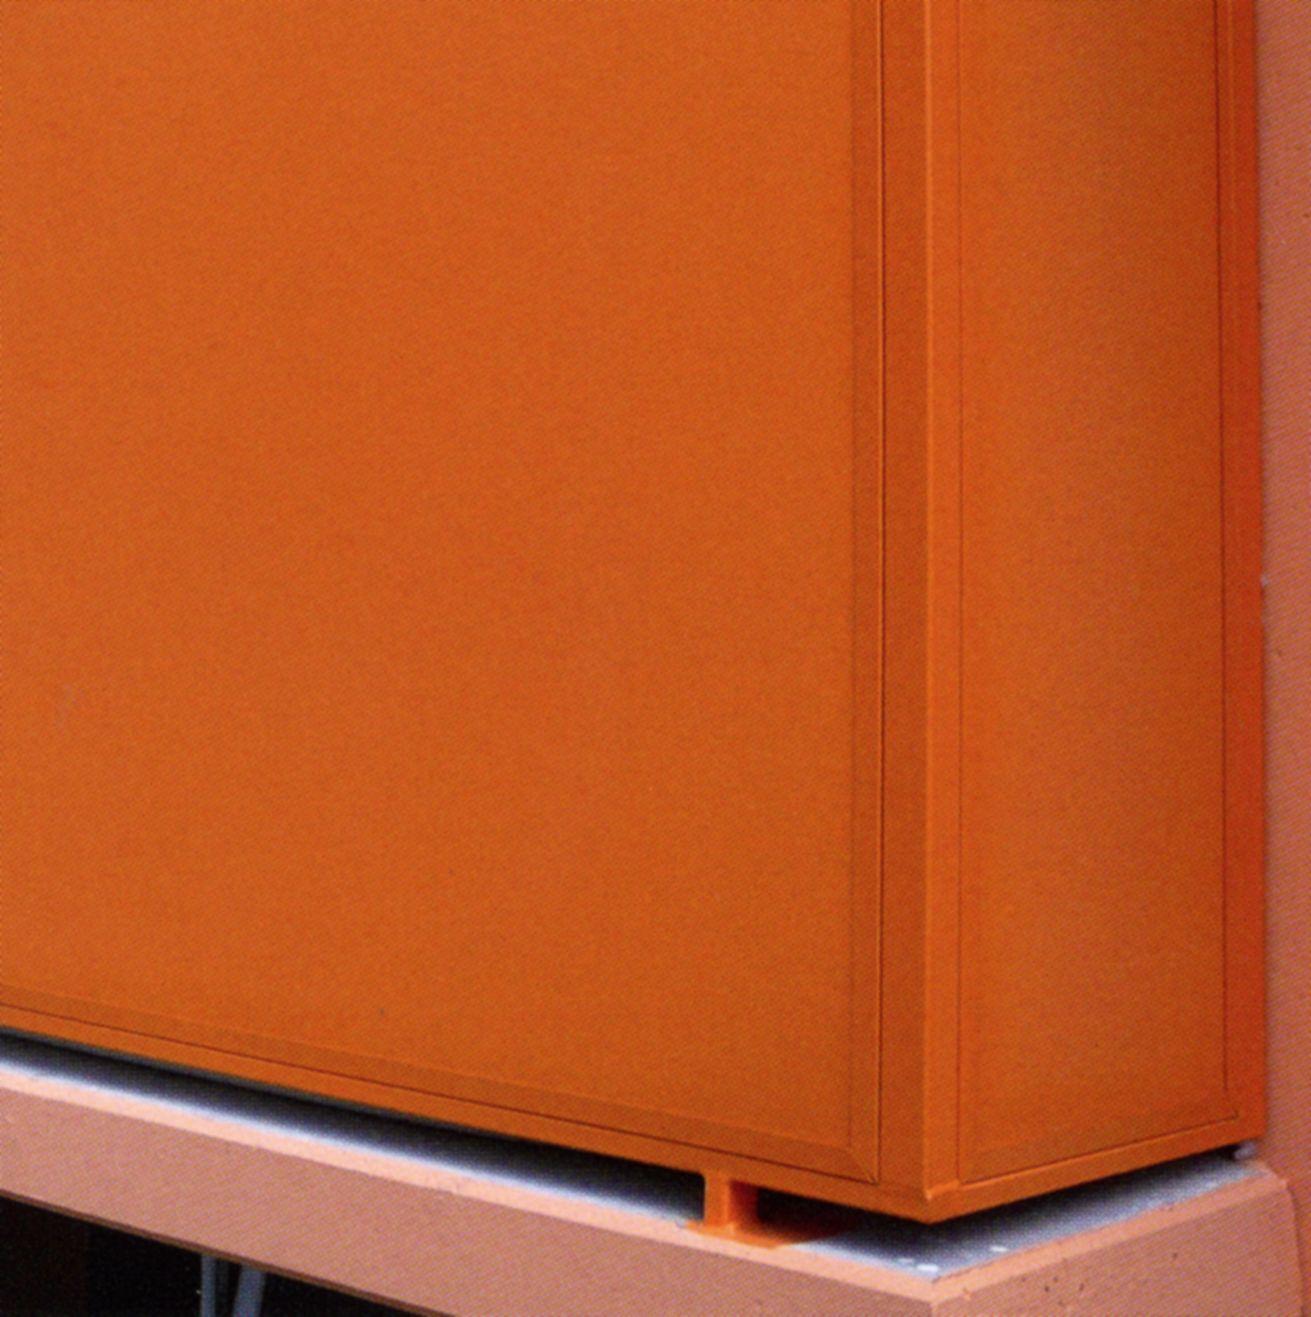 carl gmbh co kg montage befestigung. Black Bedroom Furniture Sets. Home Design Ideas